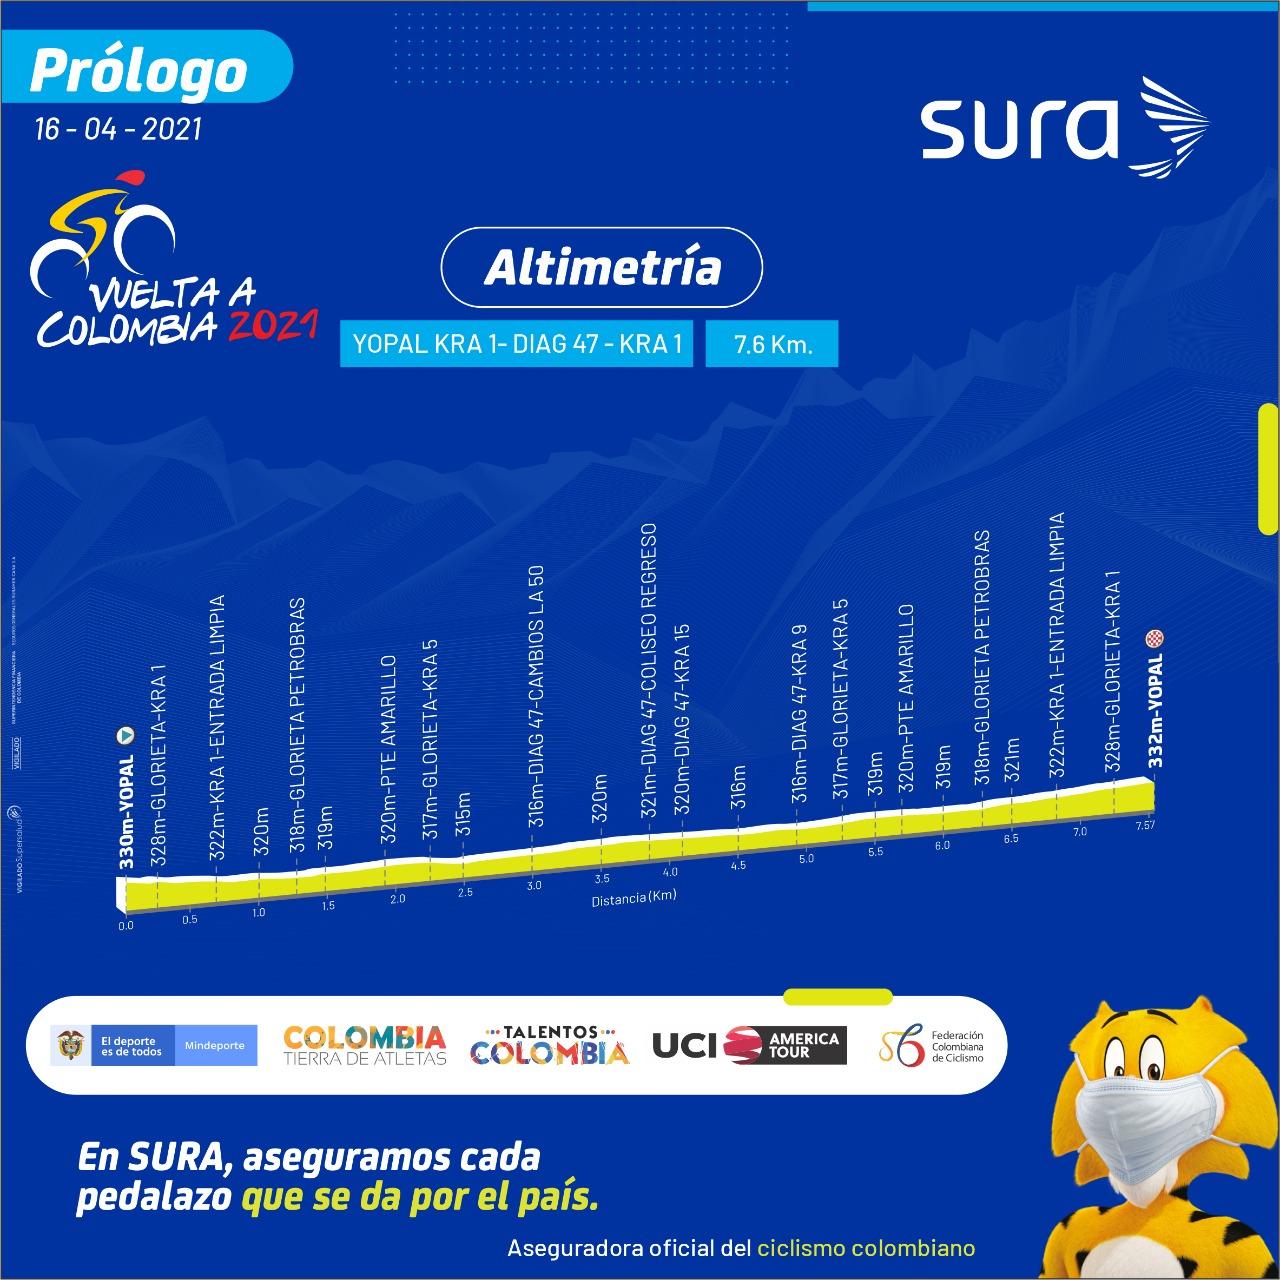 Prólogo Vuelta a Colombia 2021